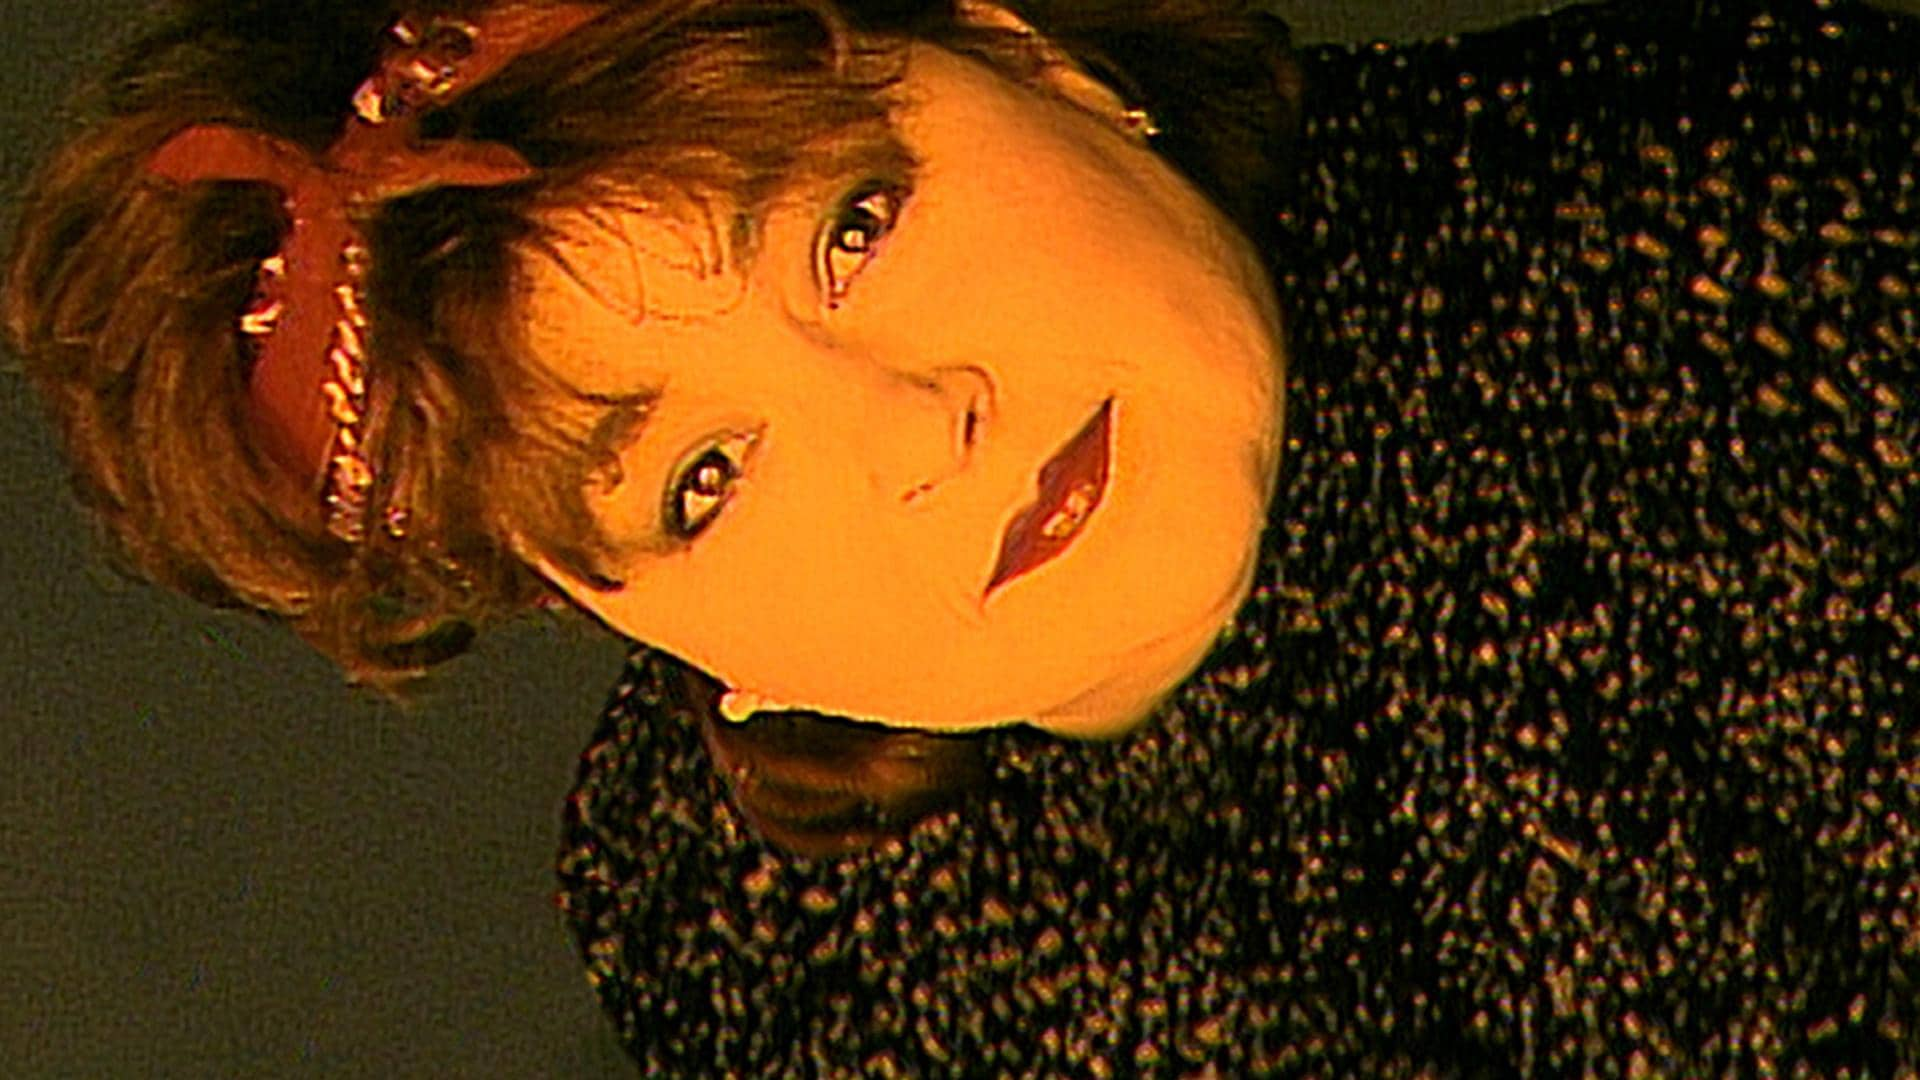 Roseanne Barr: February 16, 1991